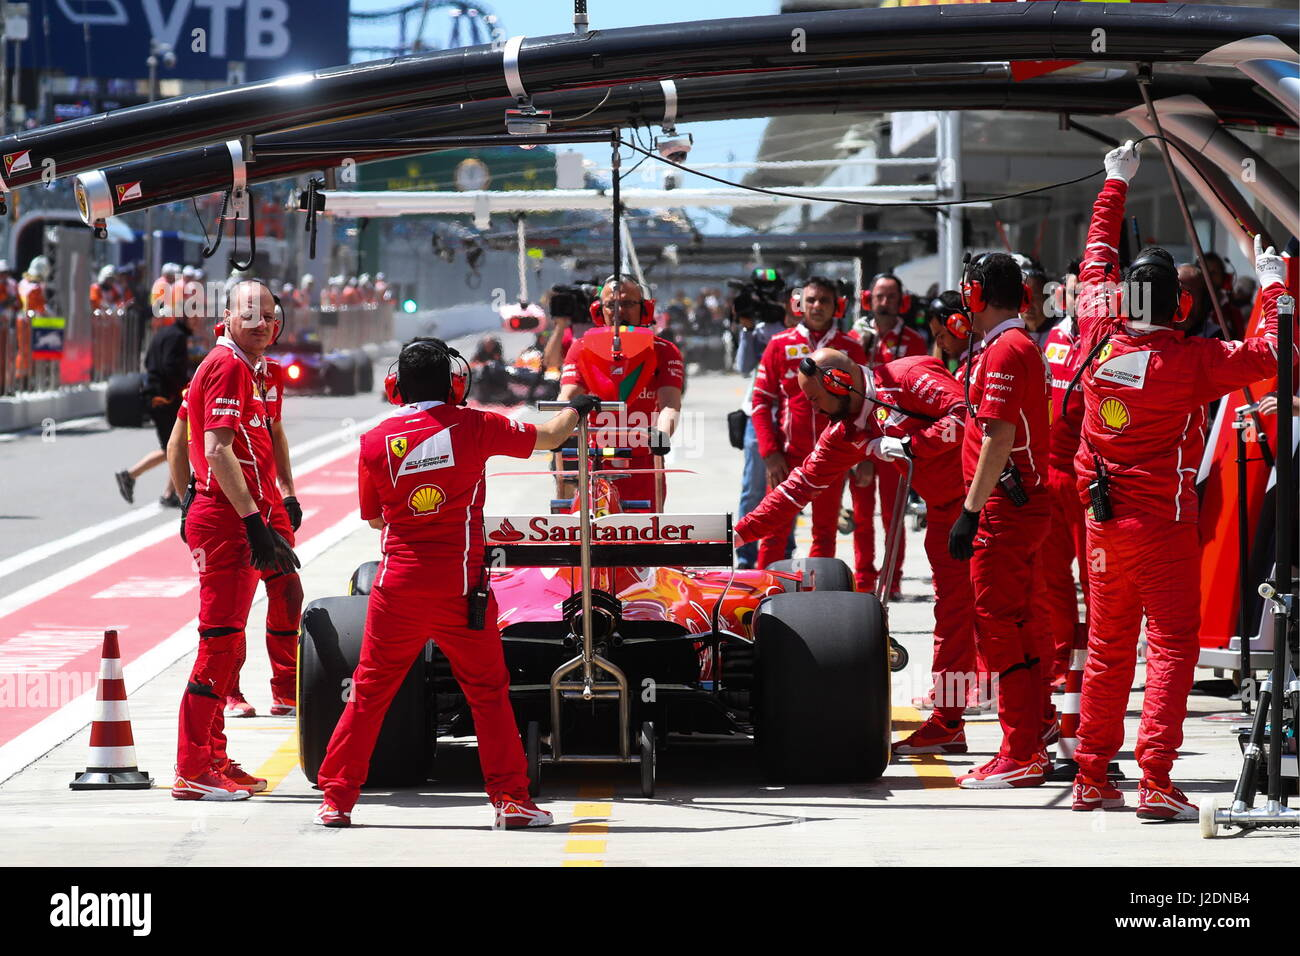 Sochi, Rusia. 28 abr, 2017. La Scuderia Ferrari F1 Team mecánica visto durante una sesión de práctica antes de laFoto de stock